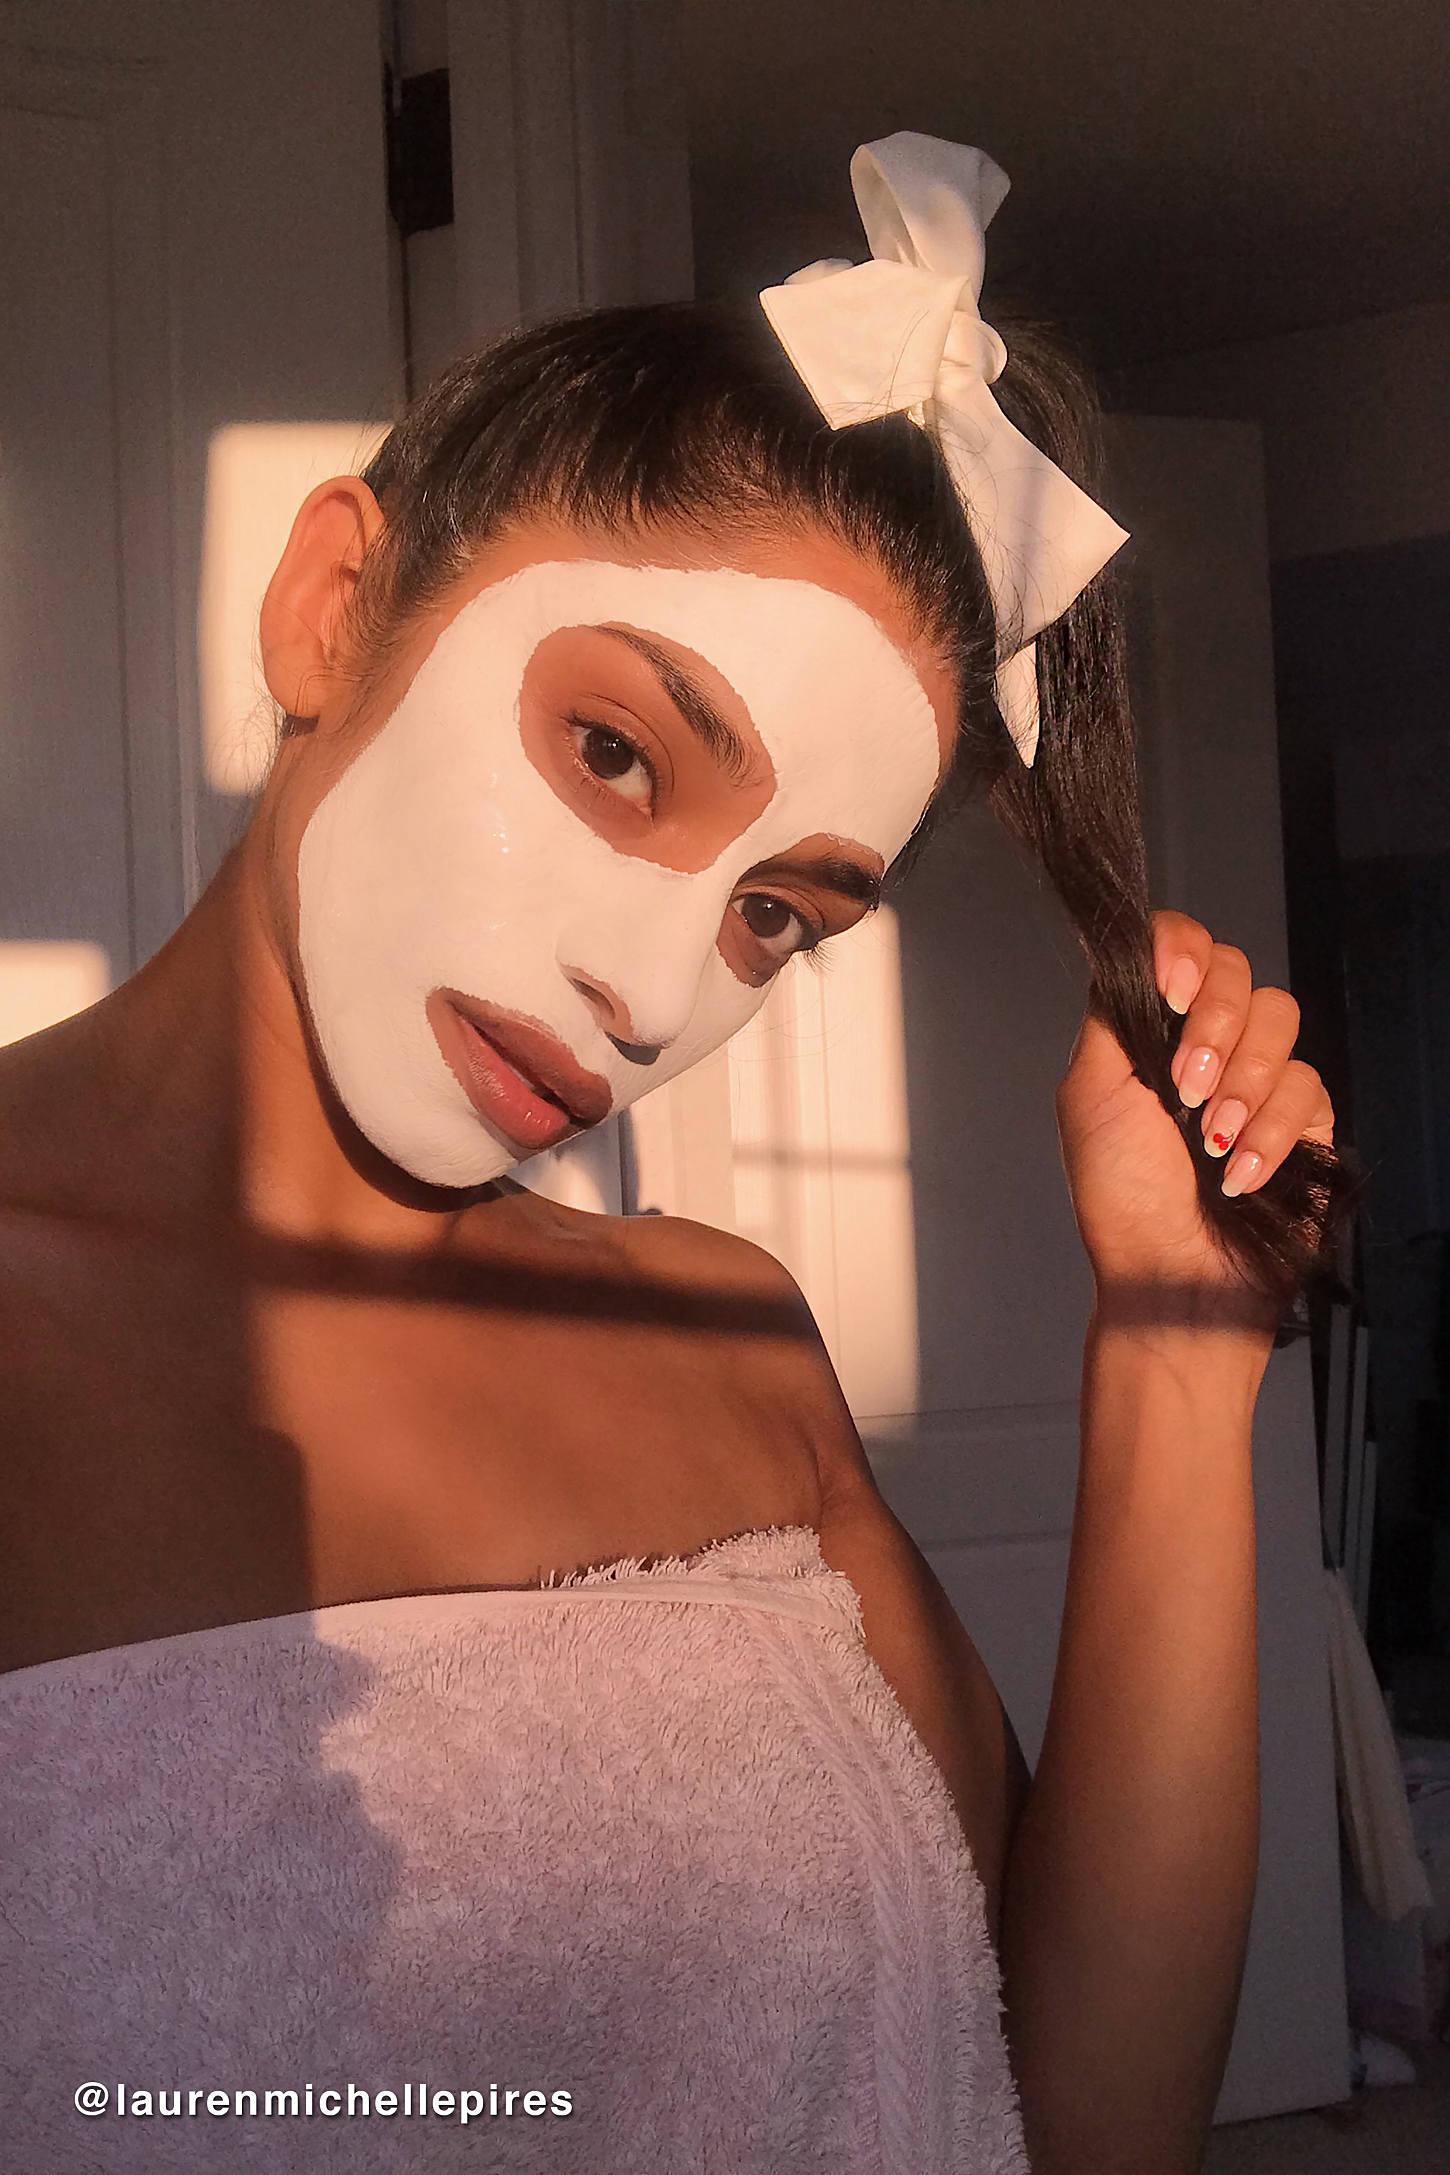 Mario Badescu - Brightening Vitamin C Mask